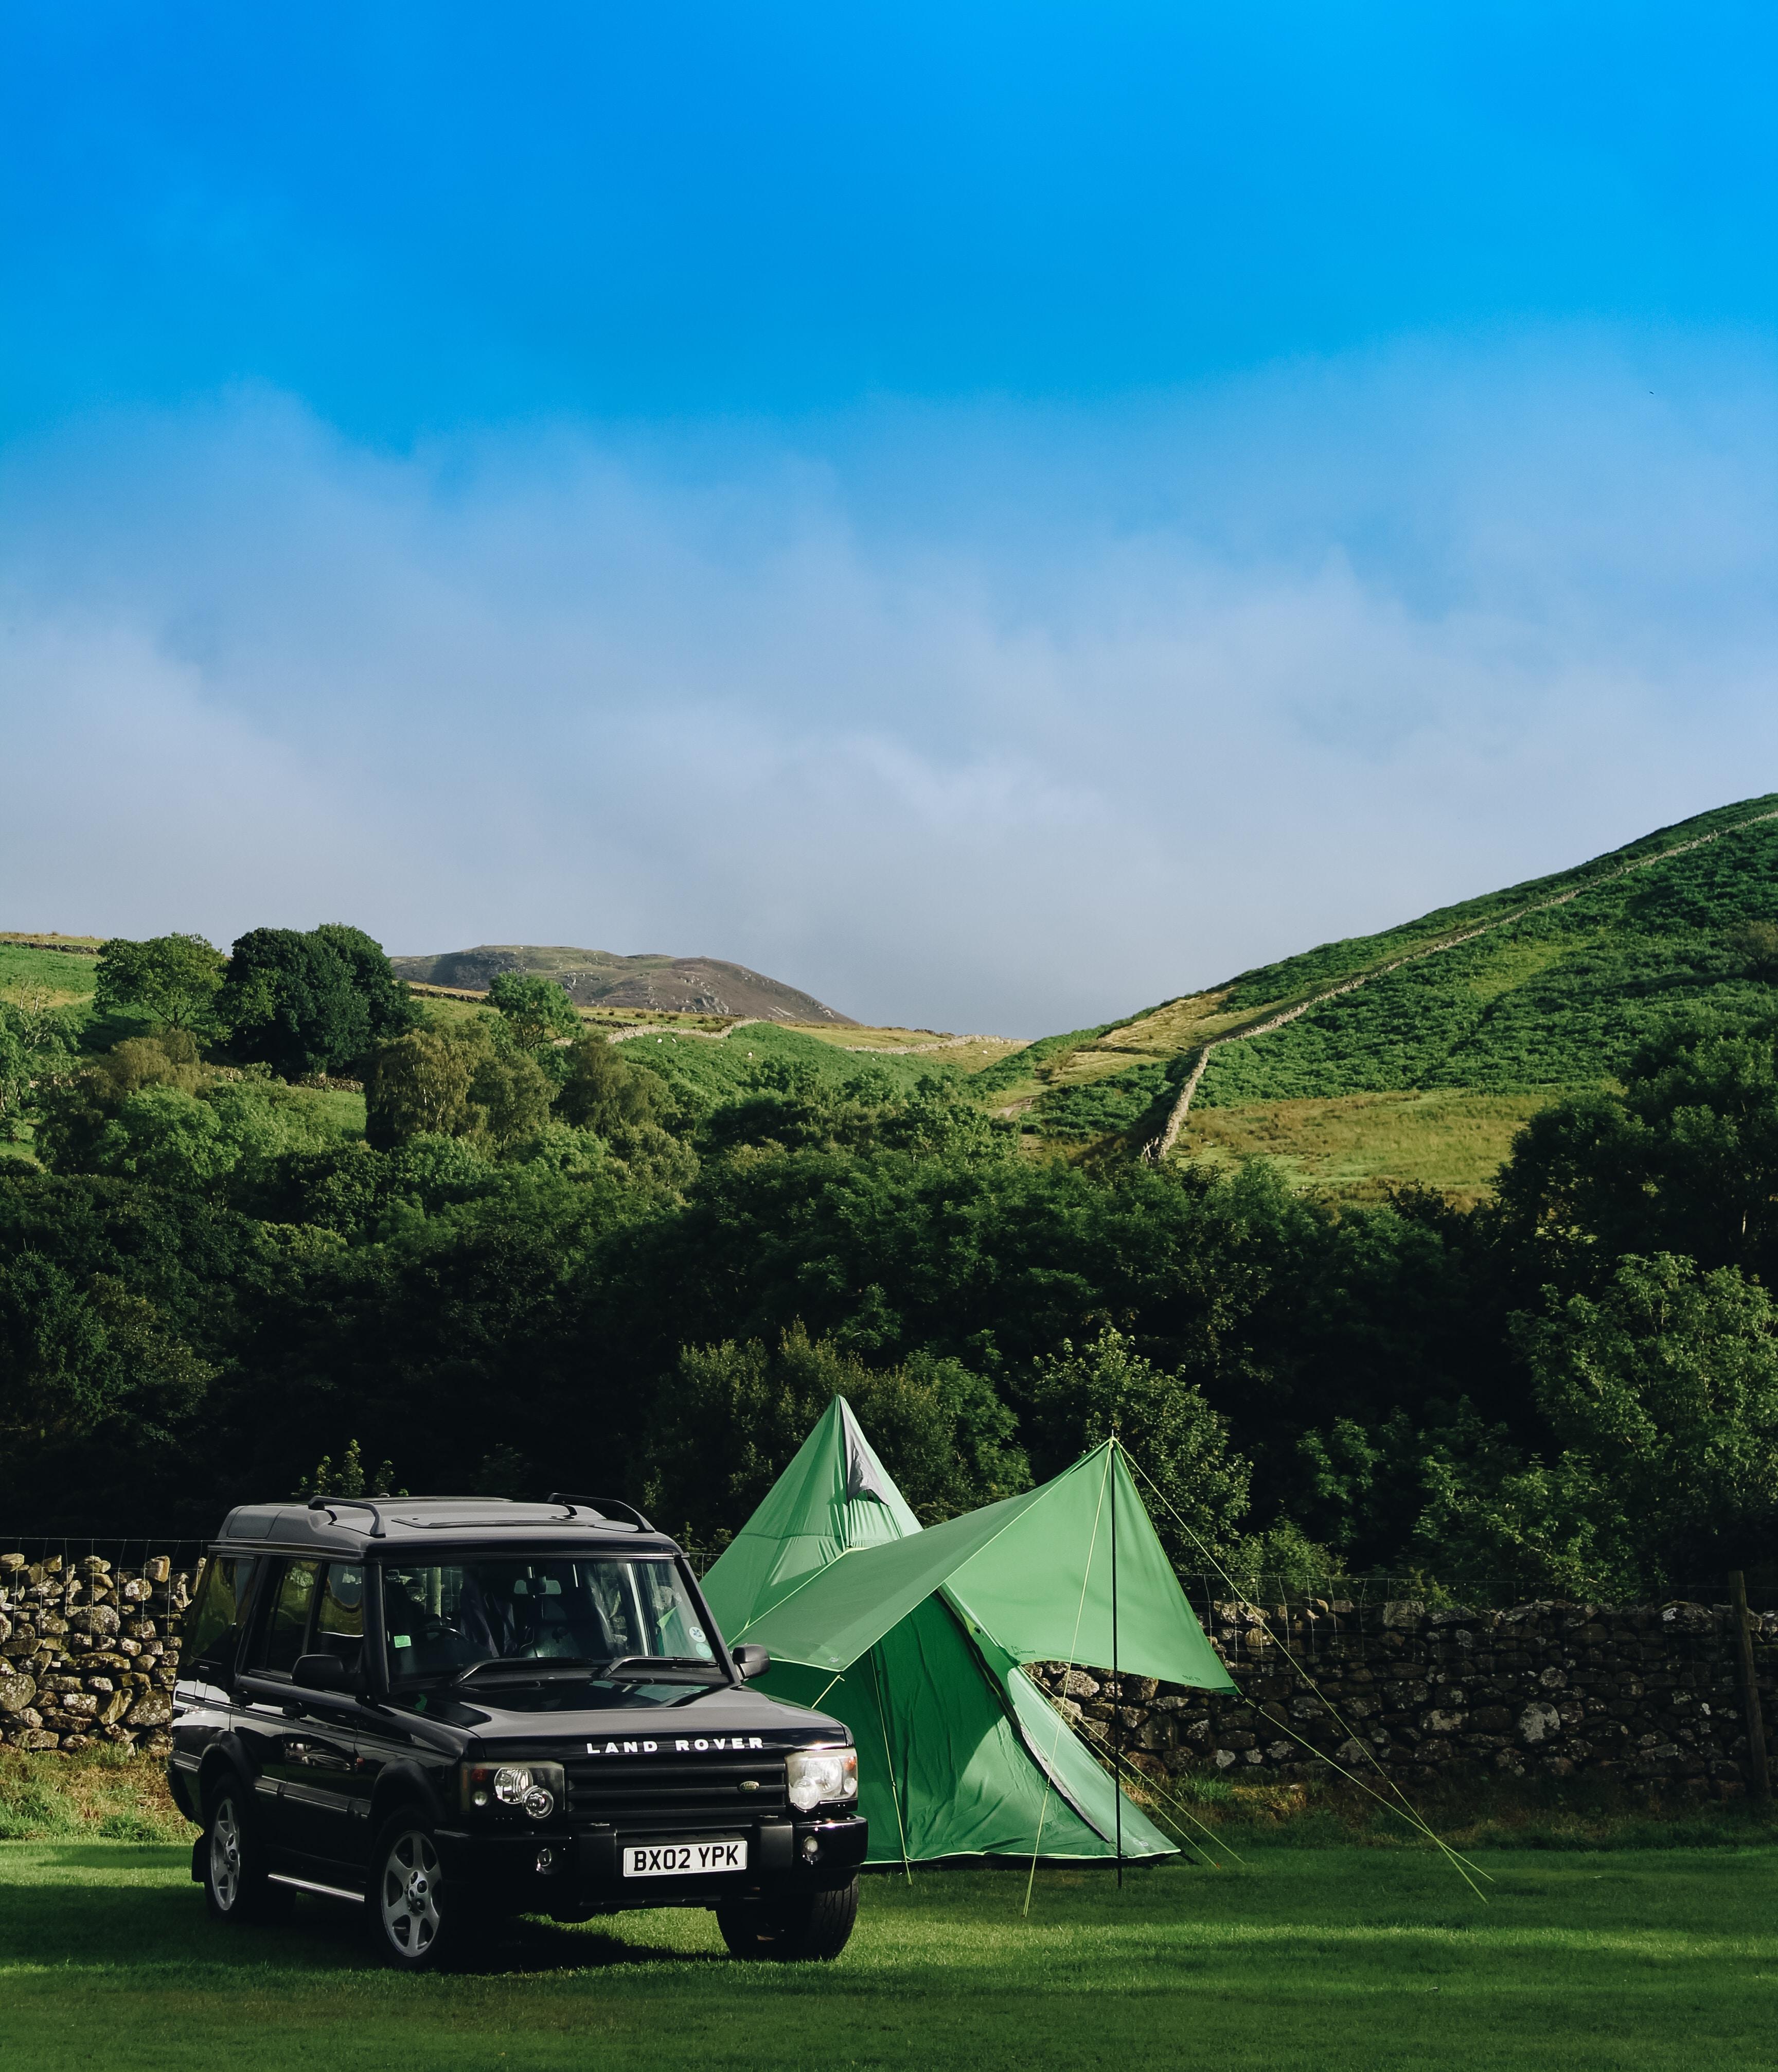 black Land Rover Range Rover SUV